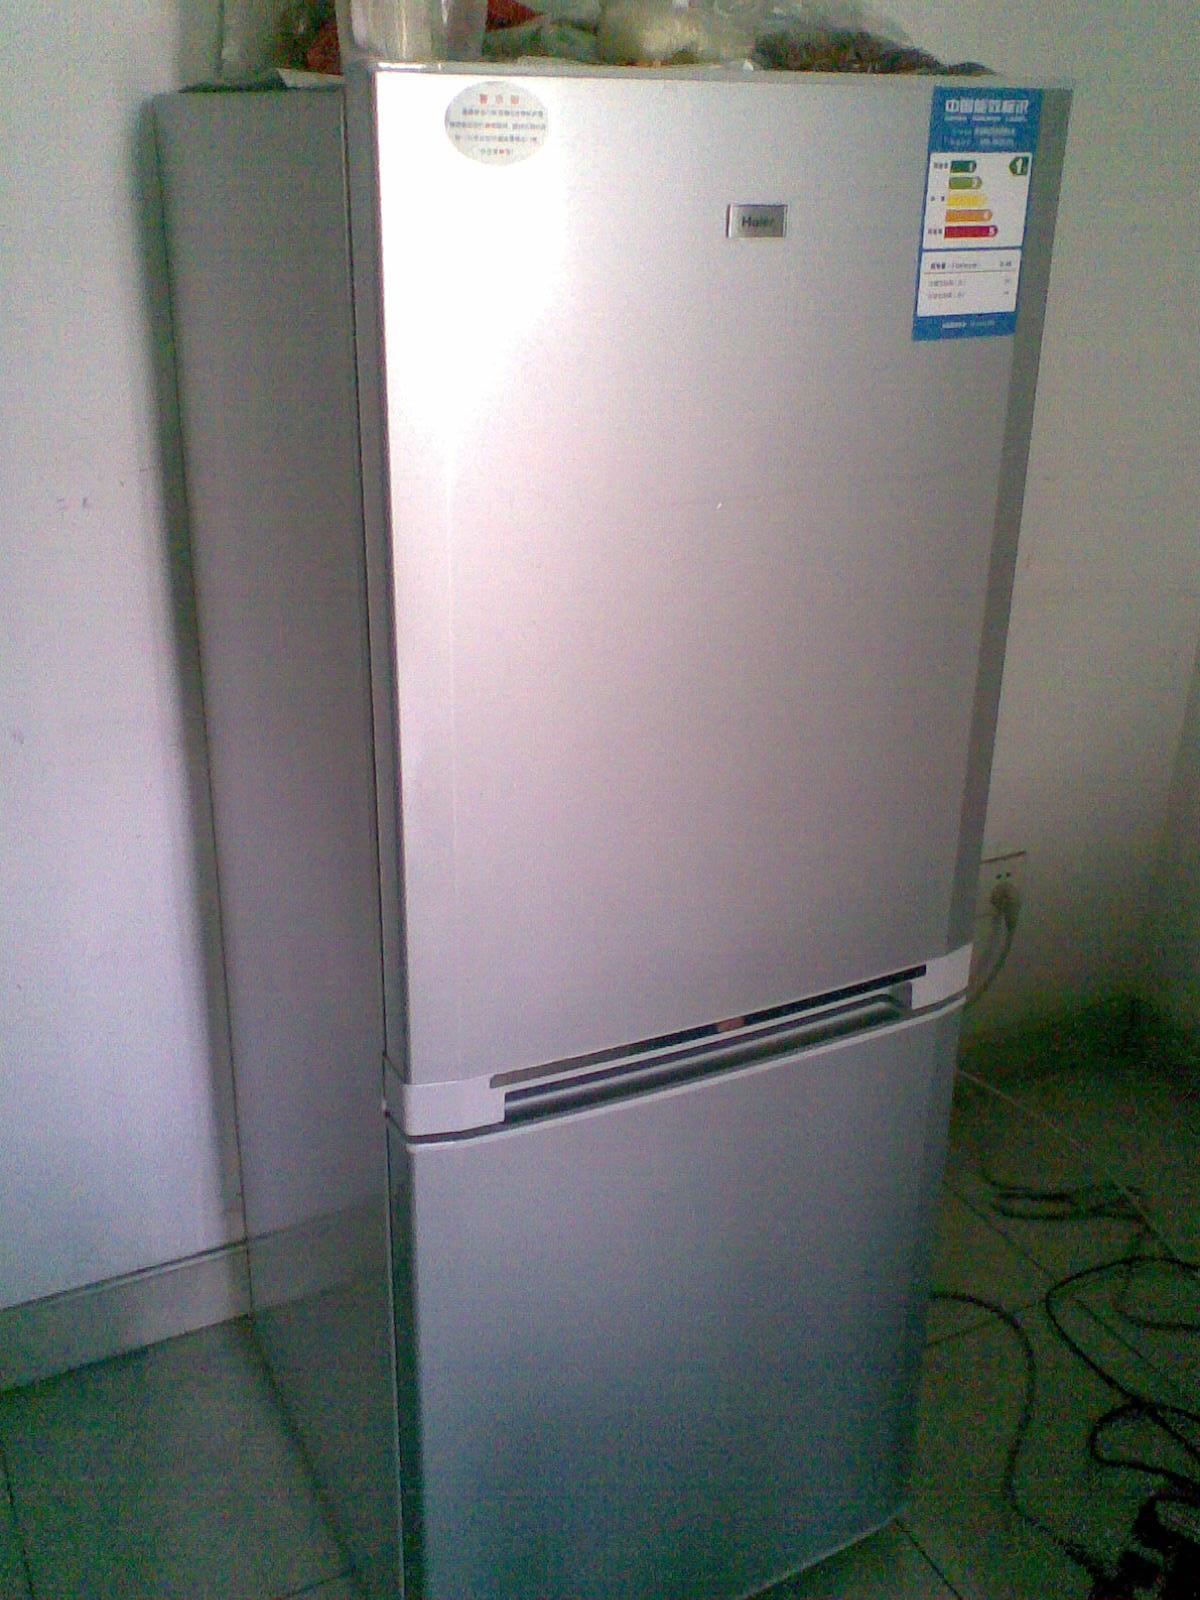 转闲置海尔冰箱bcd-155td ga